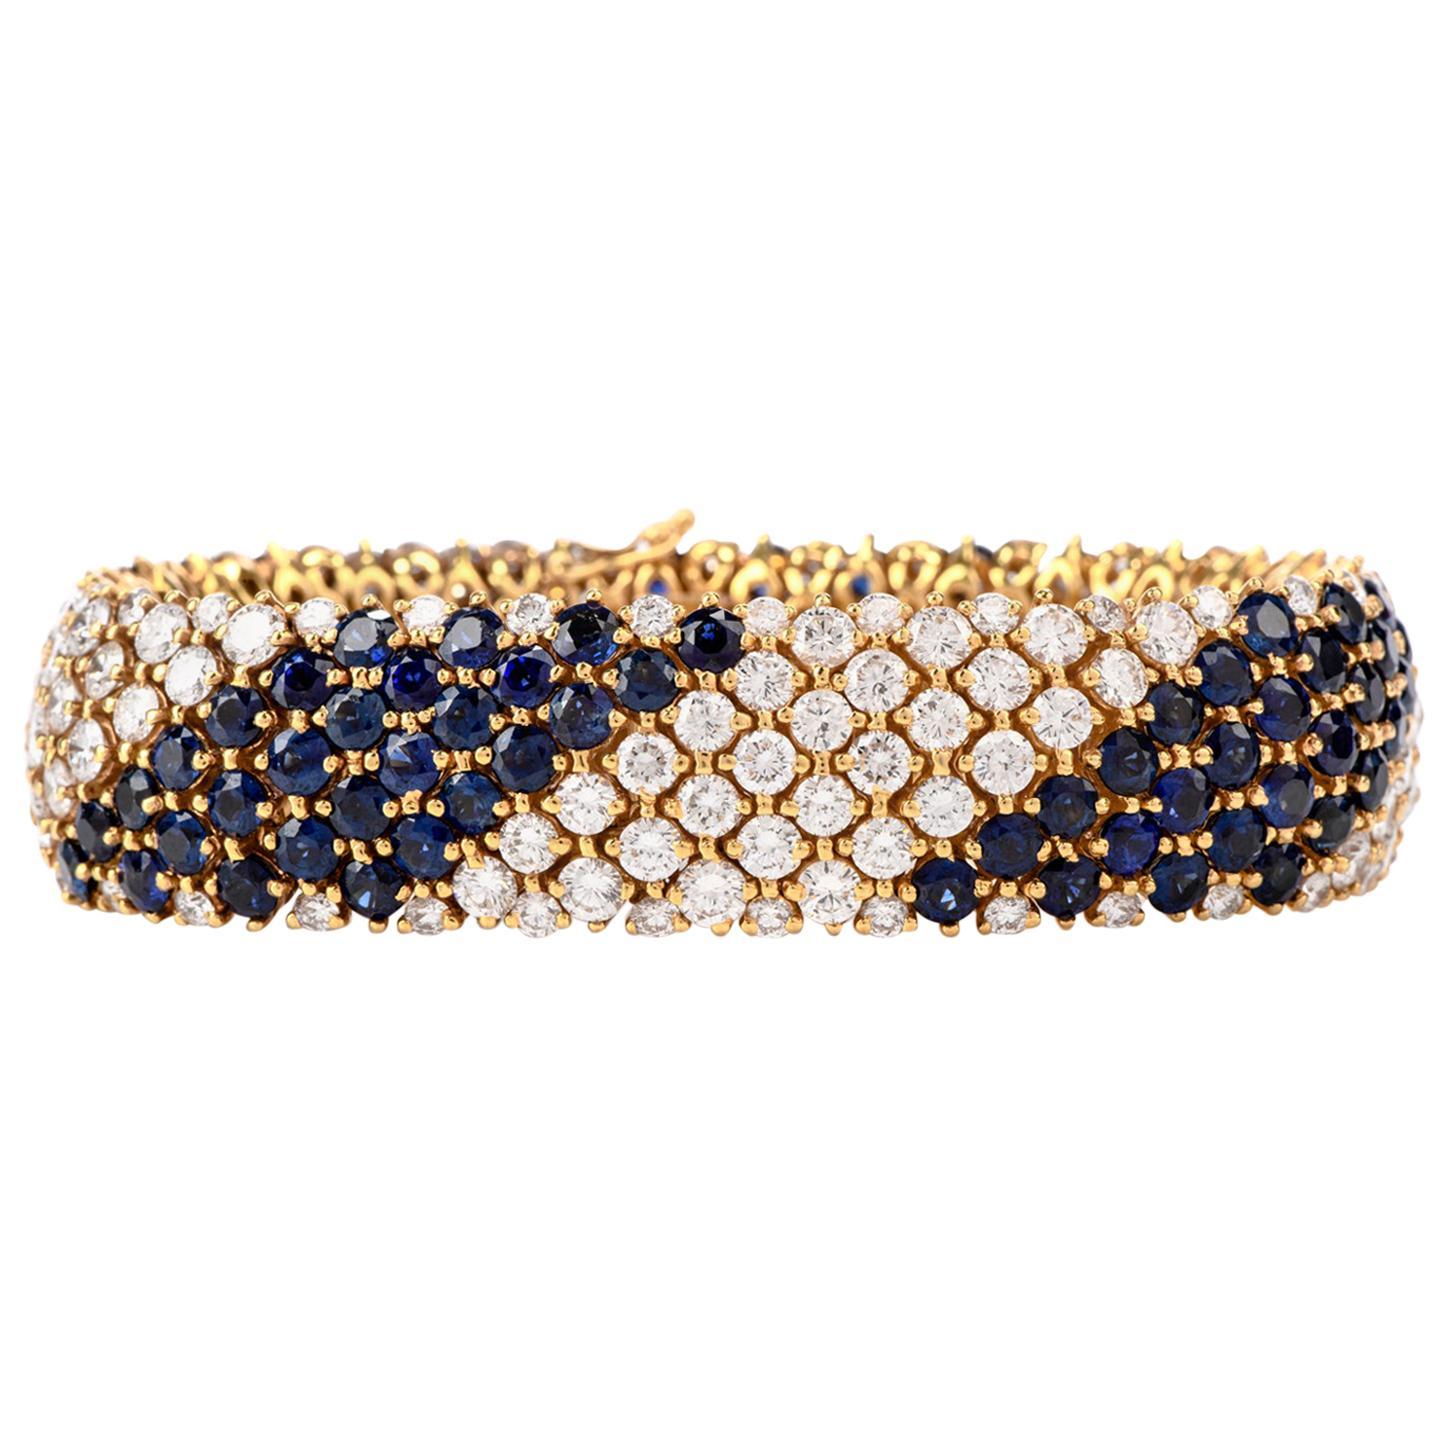 1980s Wide 36.28 Carat Diamond and Sapphire 18 Karat Bracelet